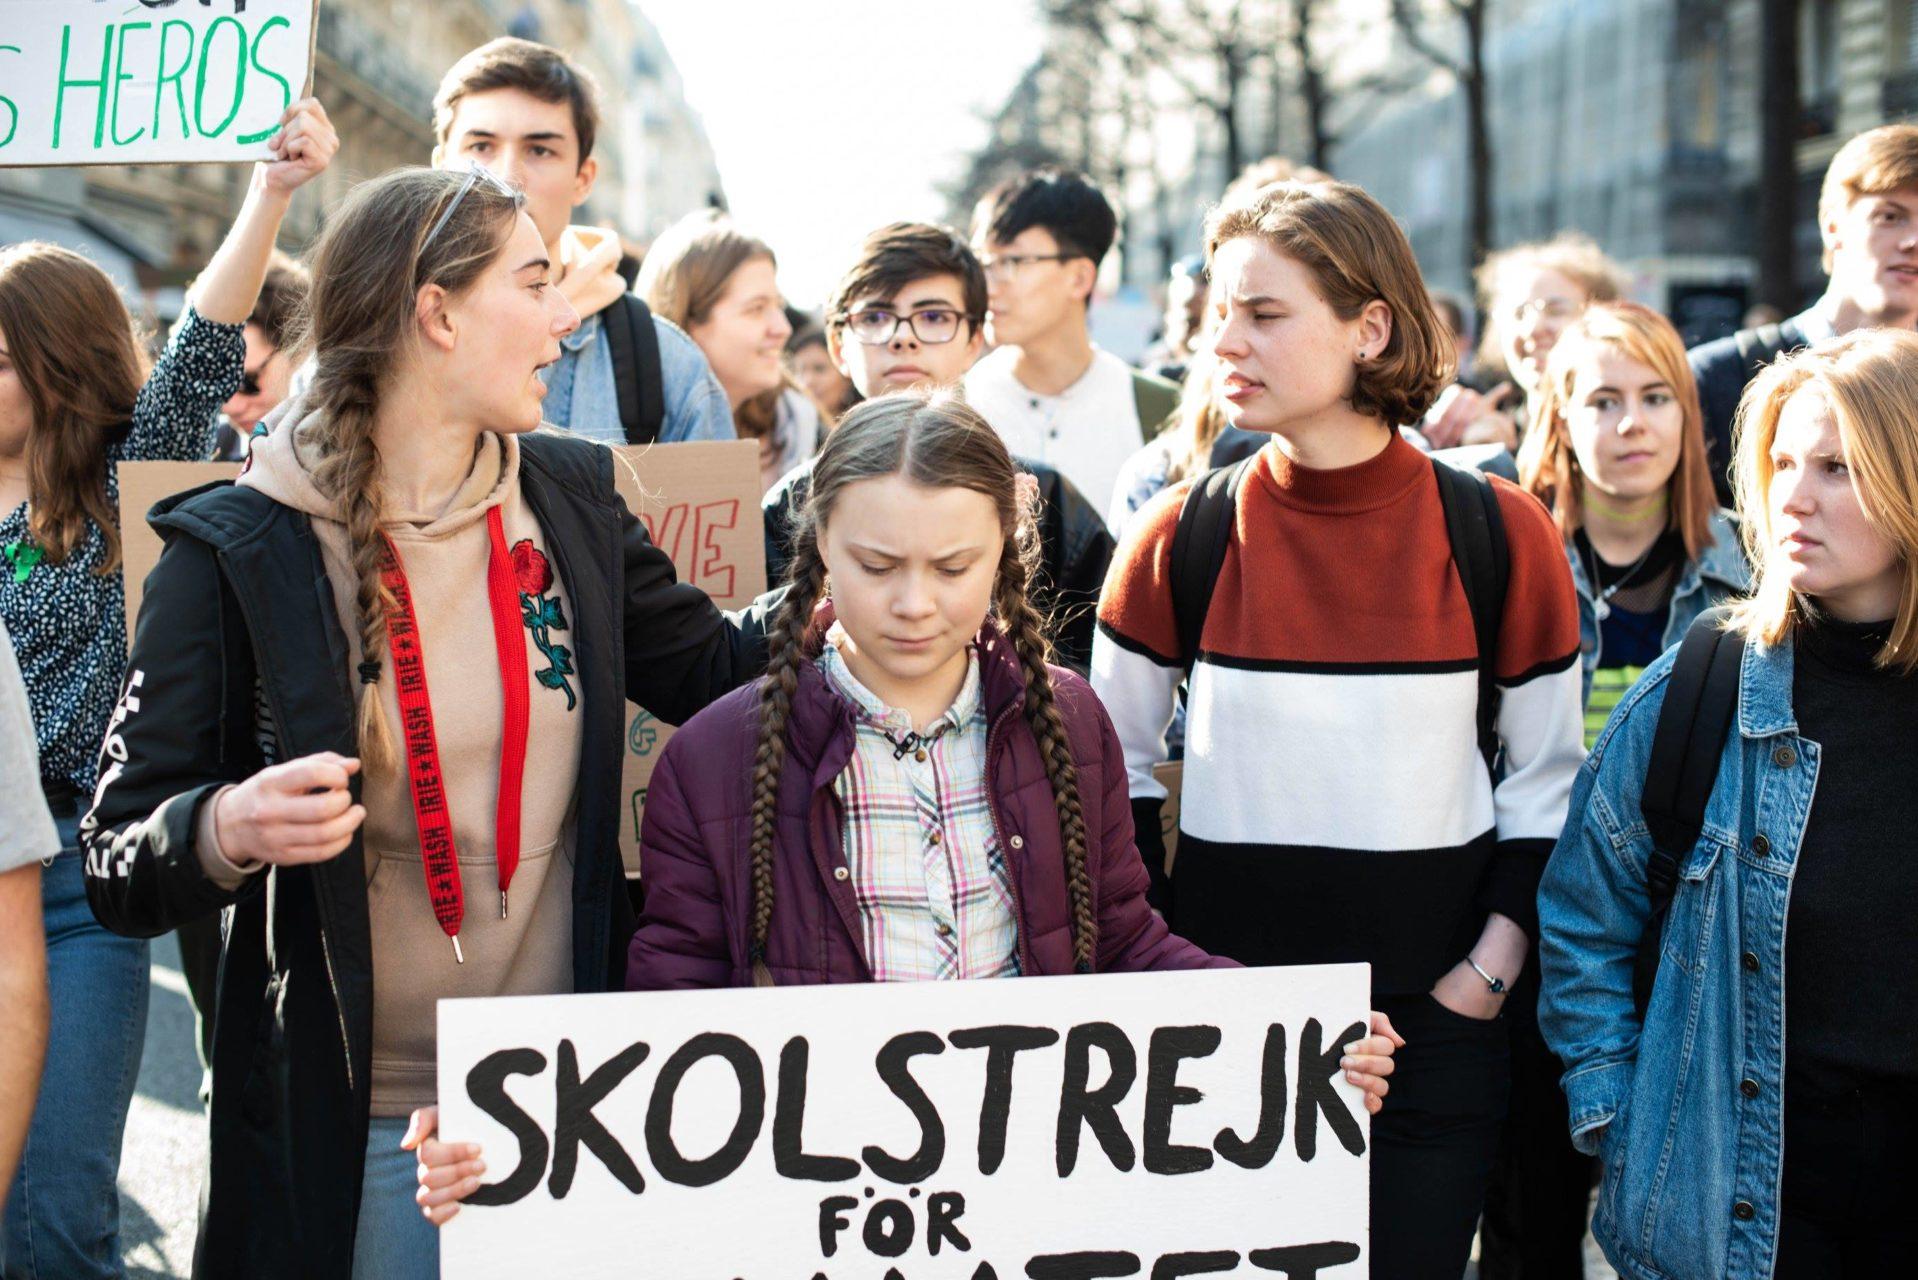 Greta Thunberg pounding the pavement in Paris